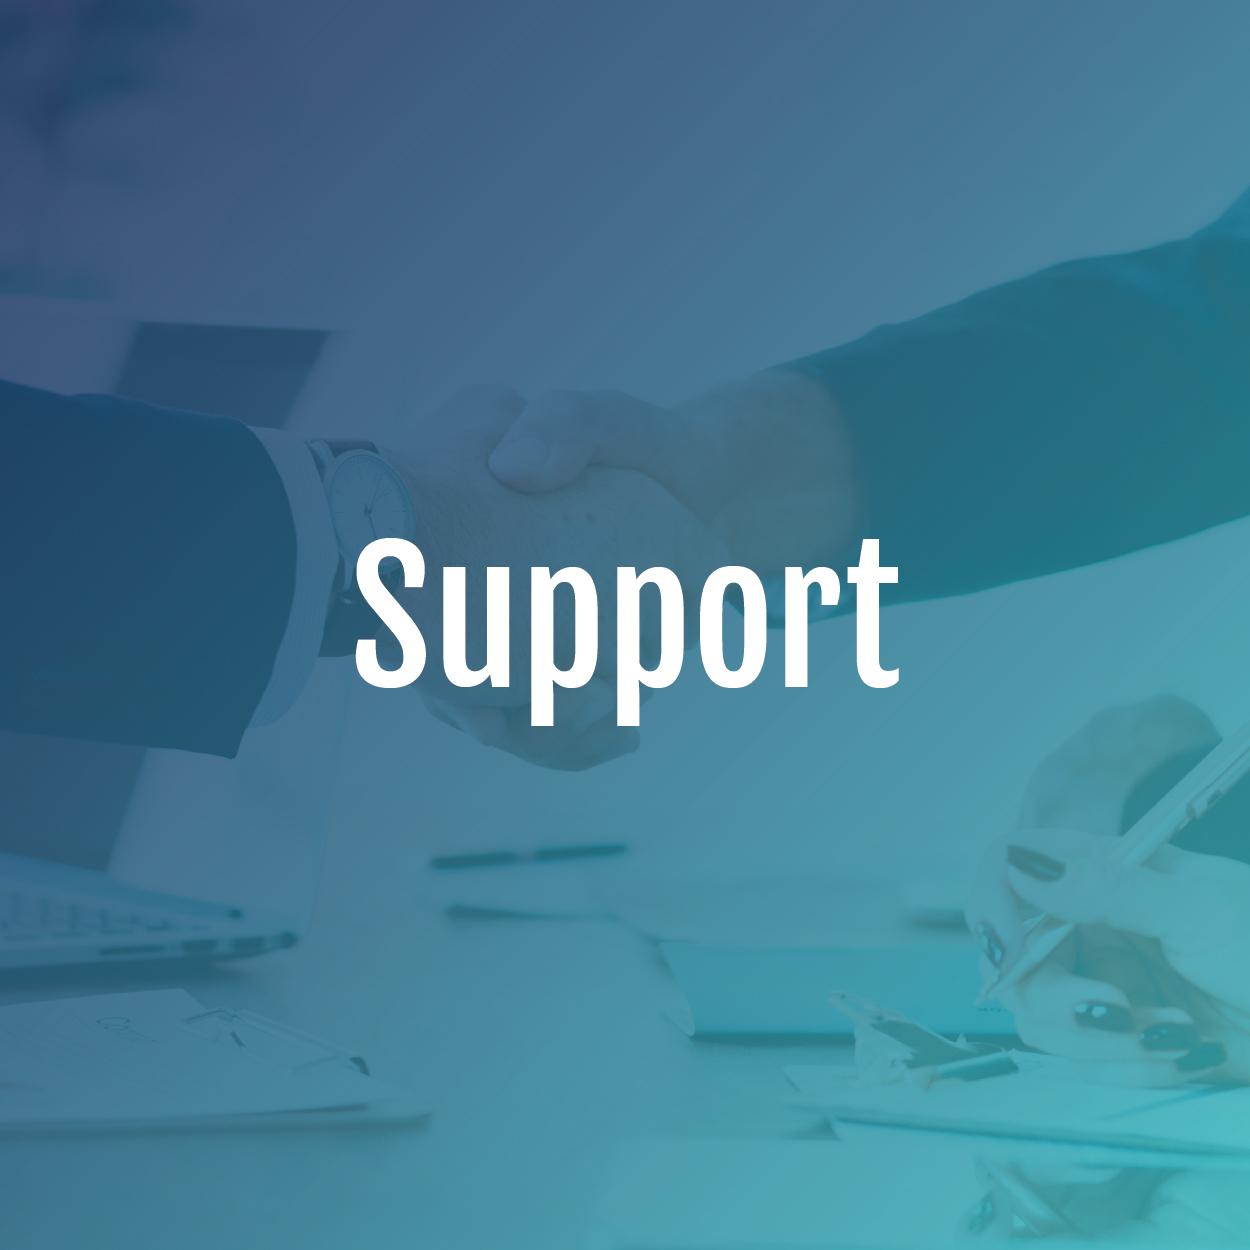 support-01.jpg